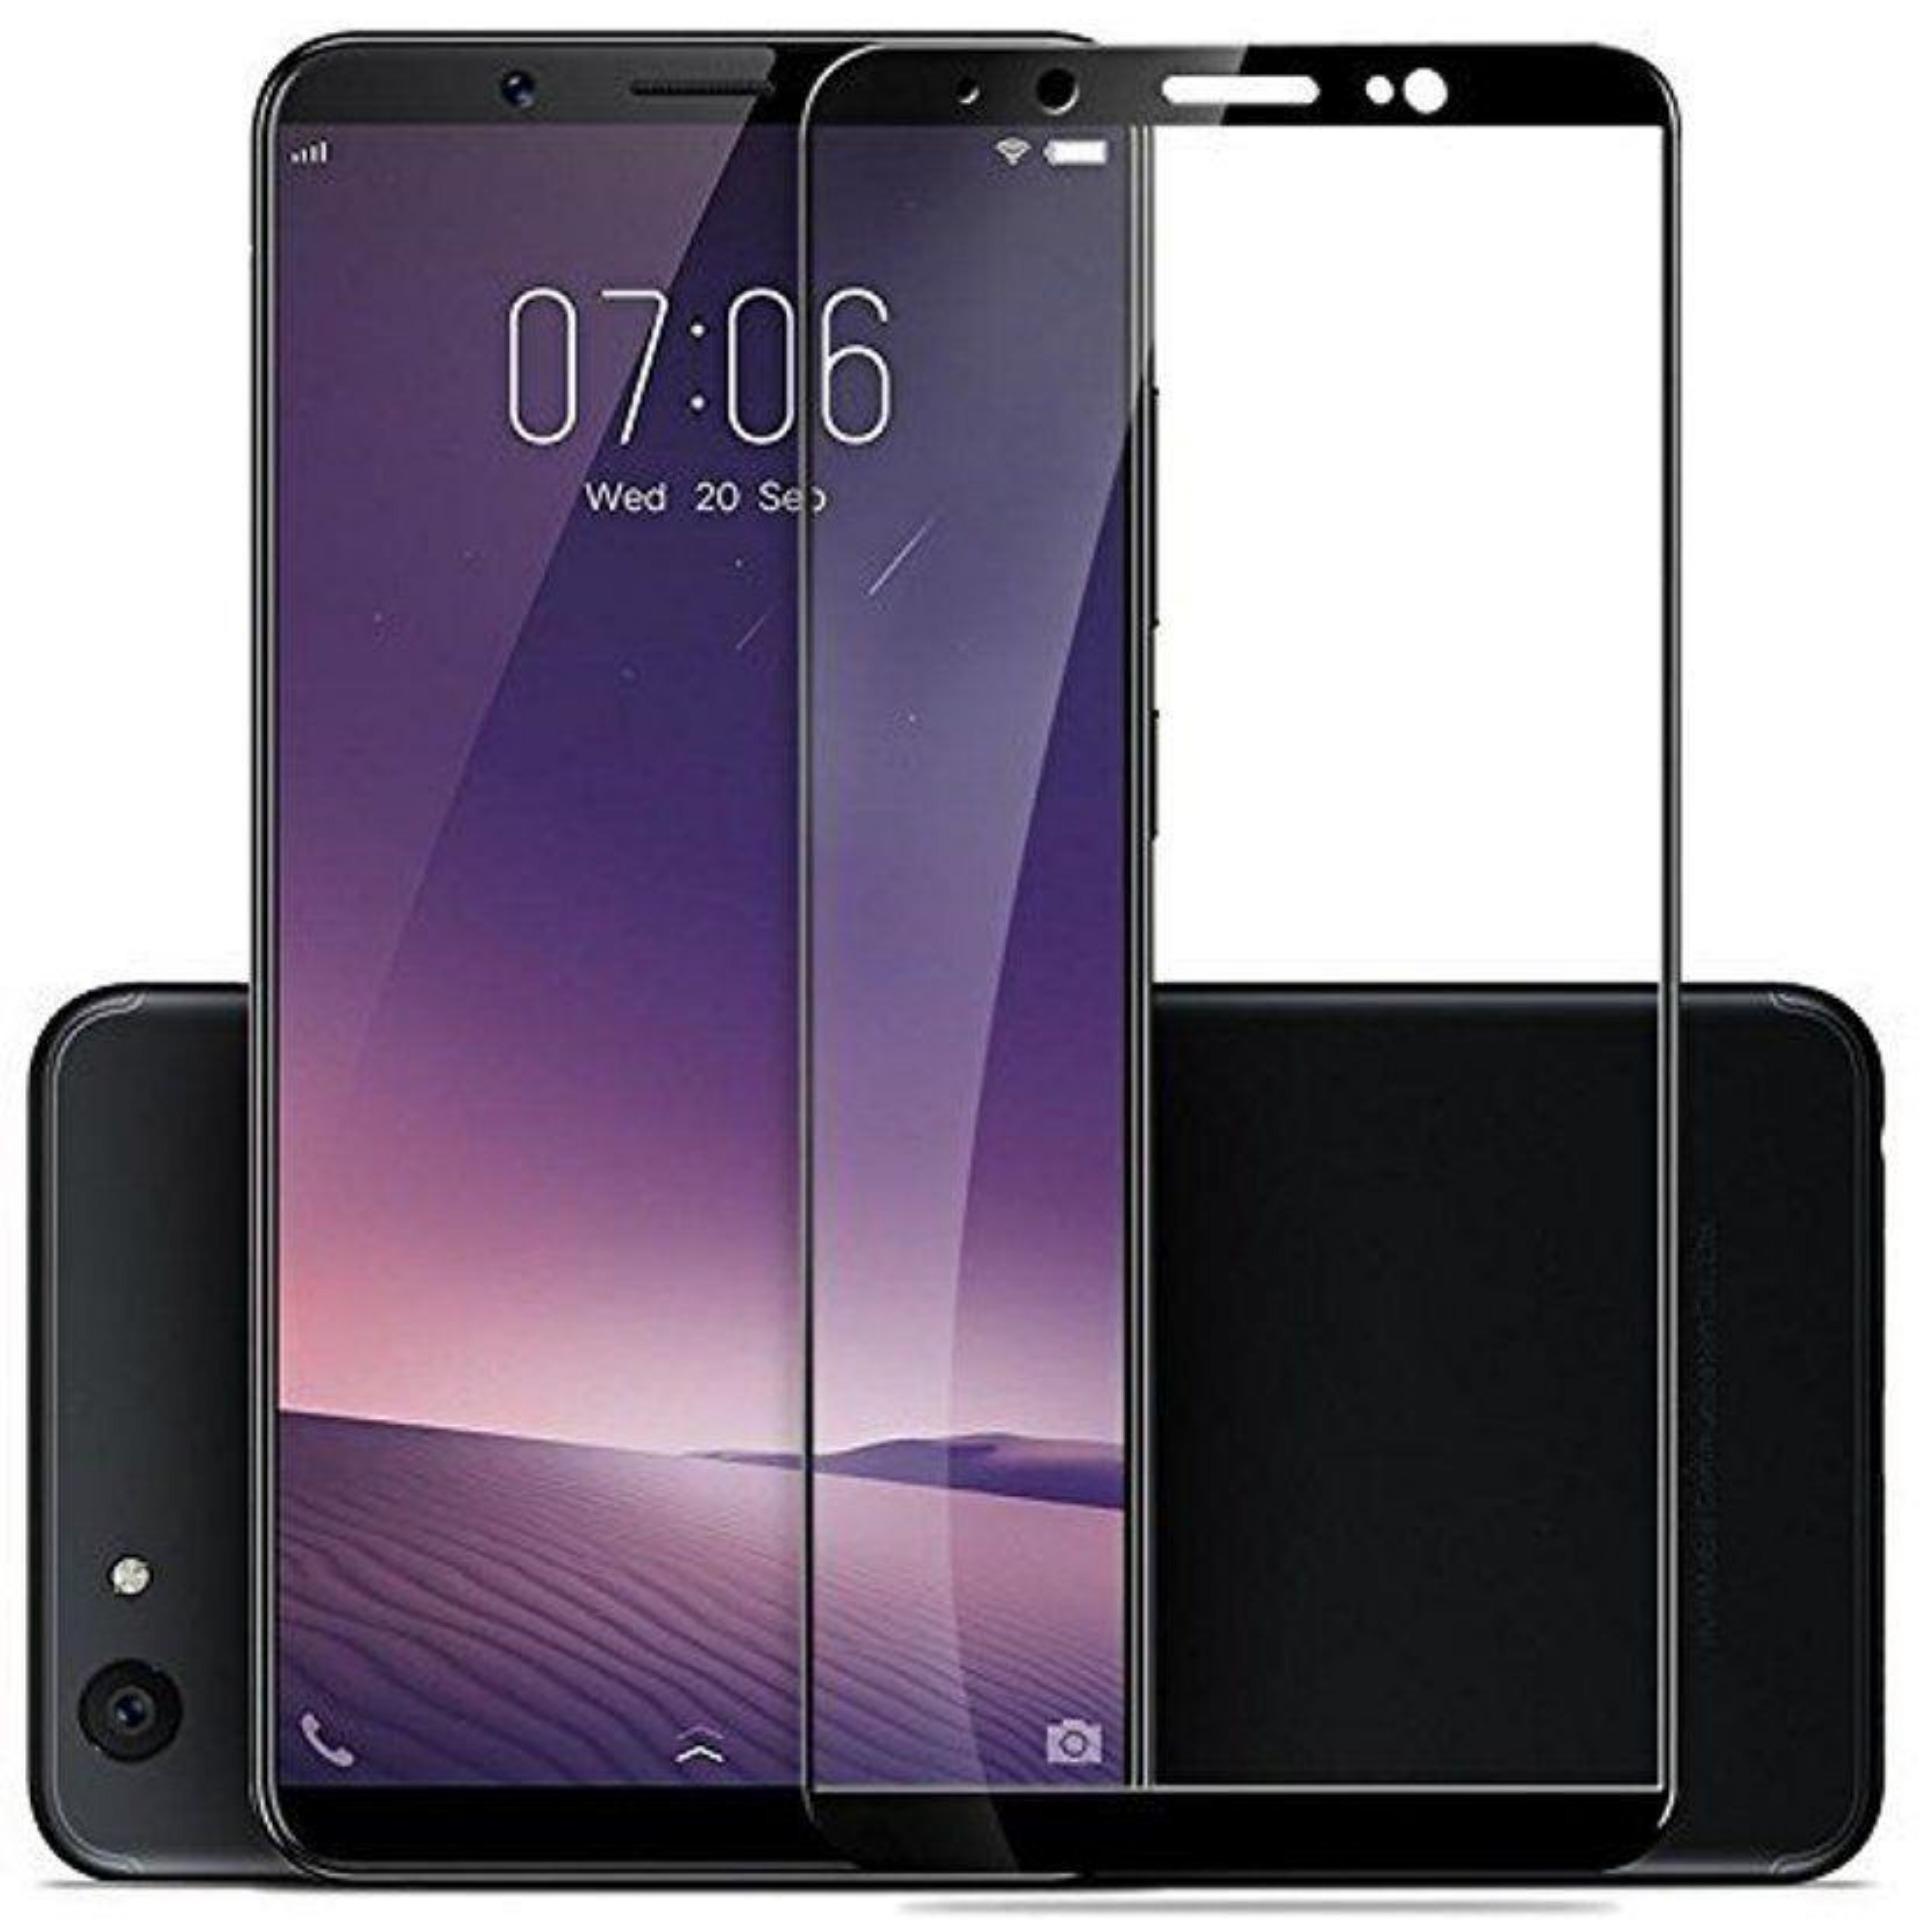 ... forXiaomi Redmi Note 3 /. Source · LOLLYPOP Tempered Glass 5D 9H PET Vivo V7 Plus Hitam Black Full Cover Protection Screen Guard